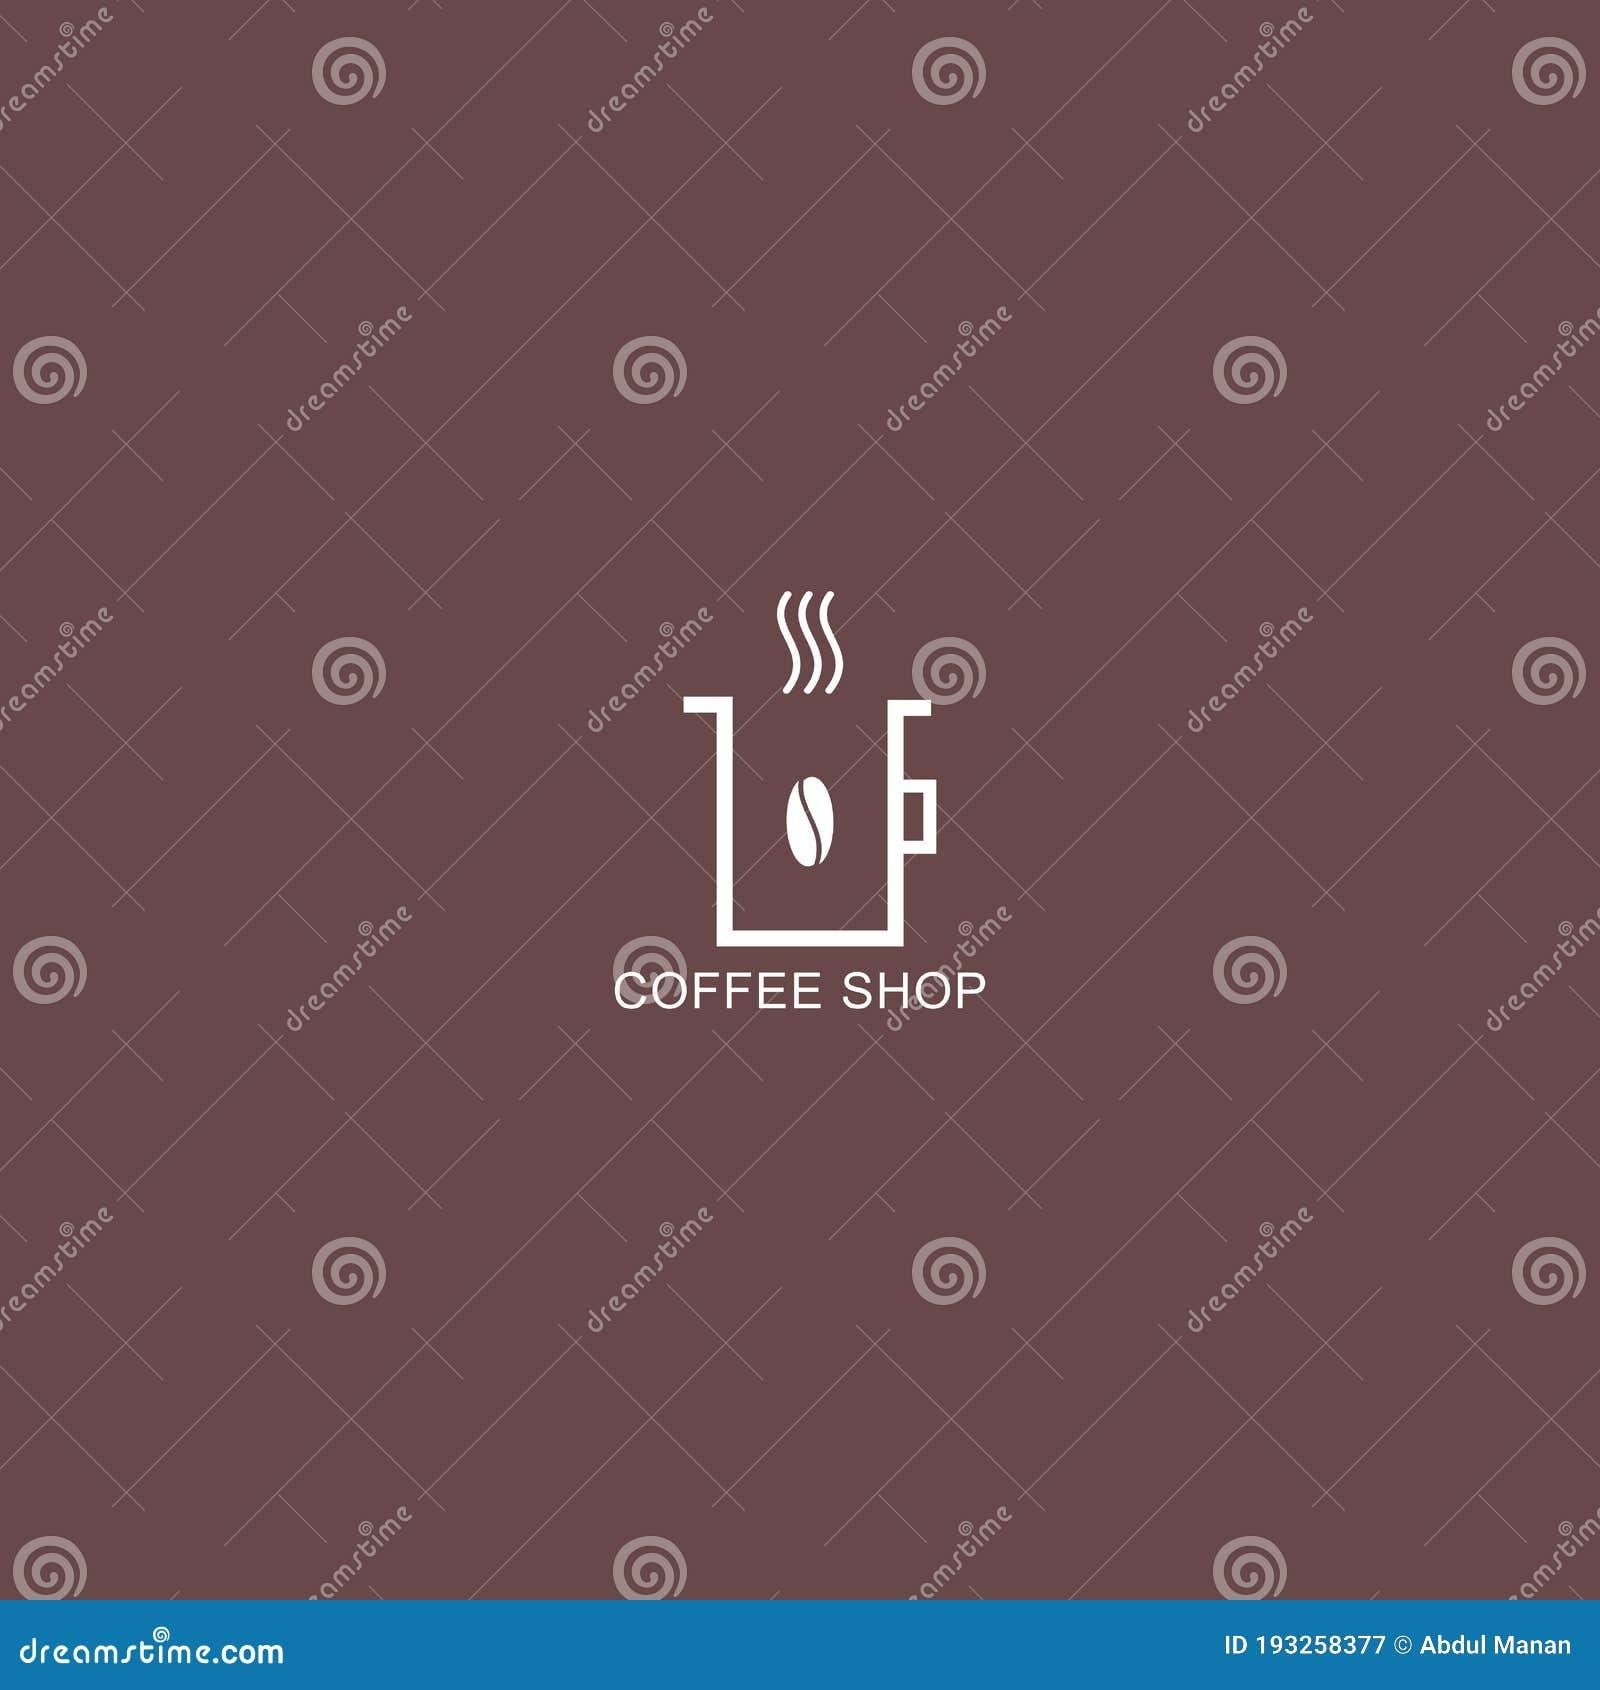 Coffee Shop Logo Simple Natural Home Logo Design Cafe Or Restaurant Logo Coffee And Tea Shop Stock Vector Illustration Of Cafe Company 193258377